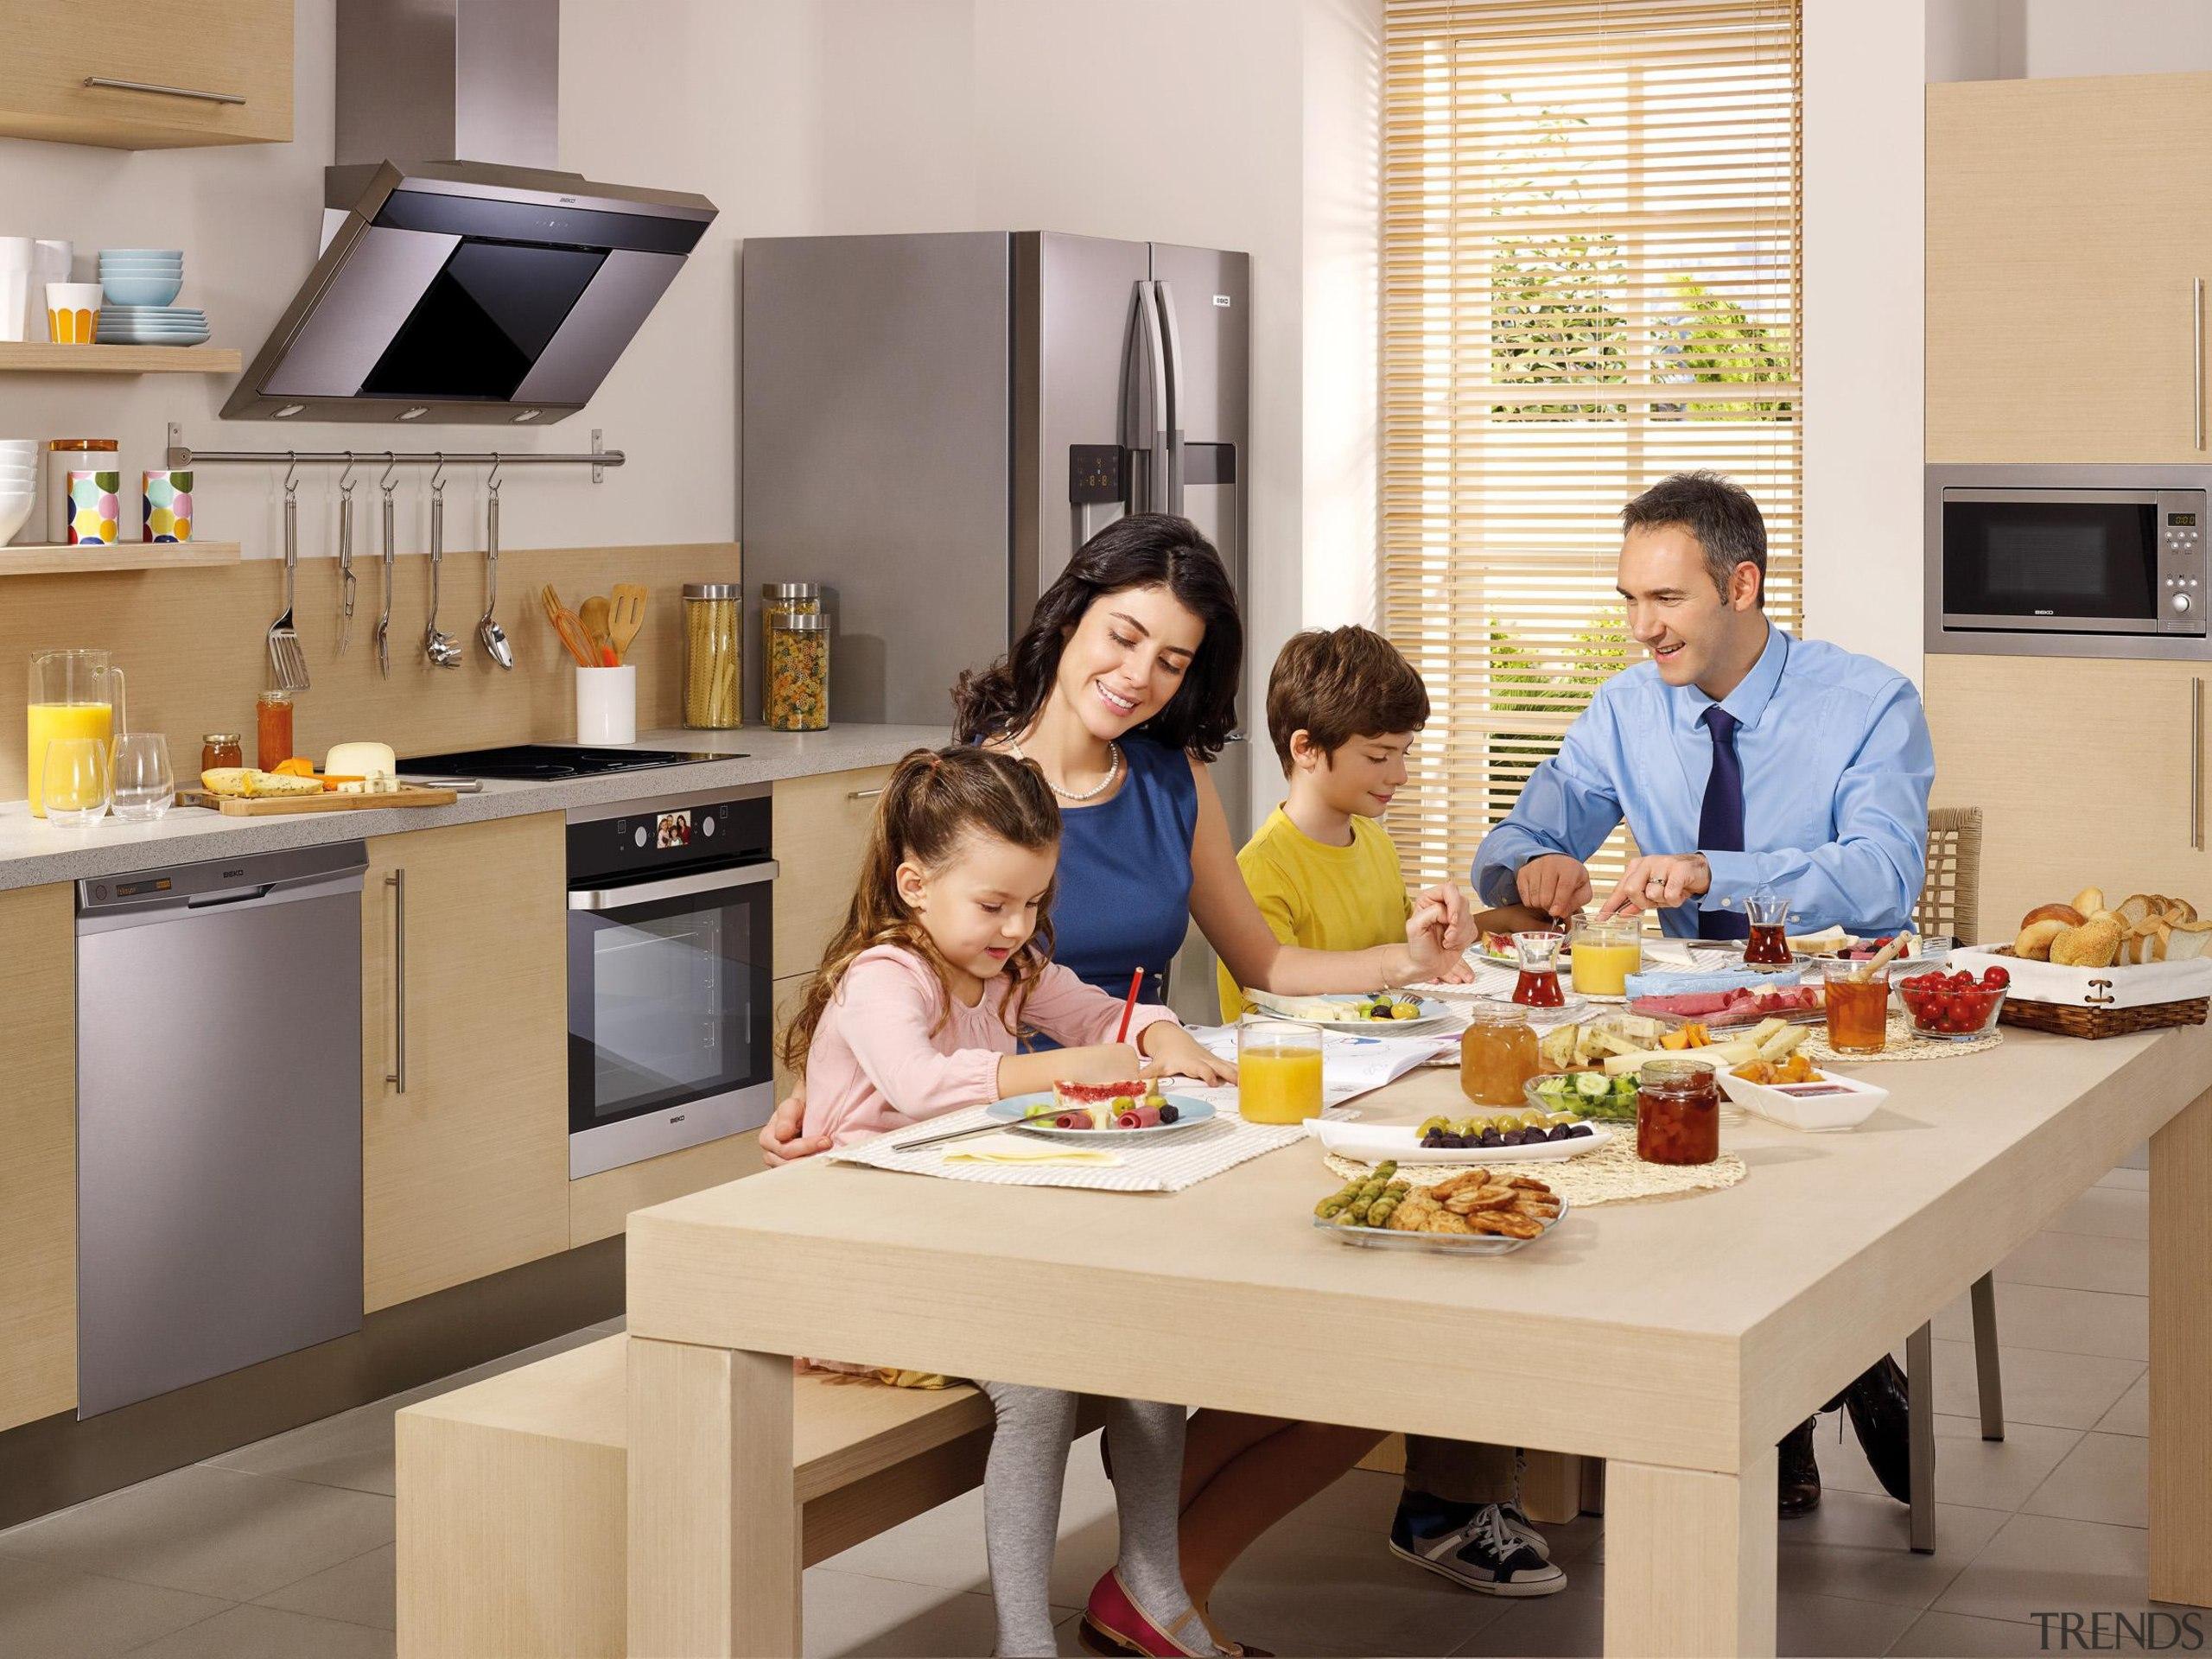 Product Images - Kitchens - cuisine   food cuisine, food, furniture, interior design, kitchen, meal, room, table, gray, orange